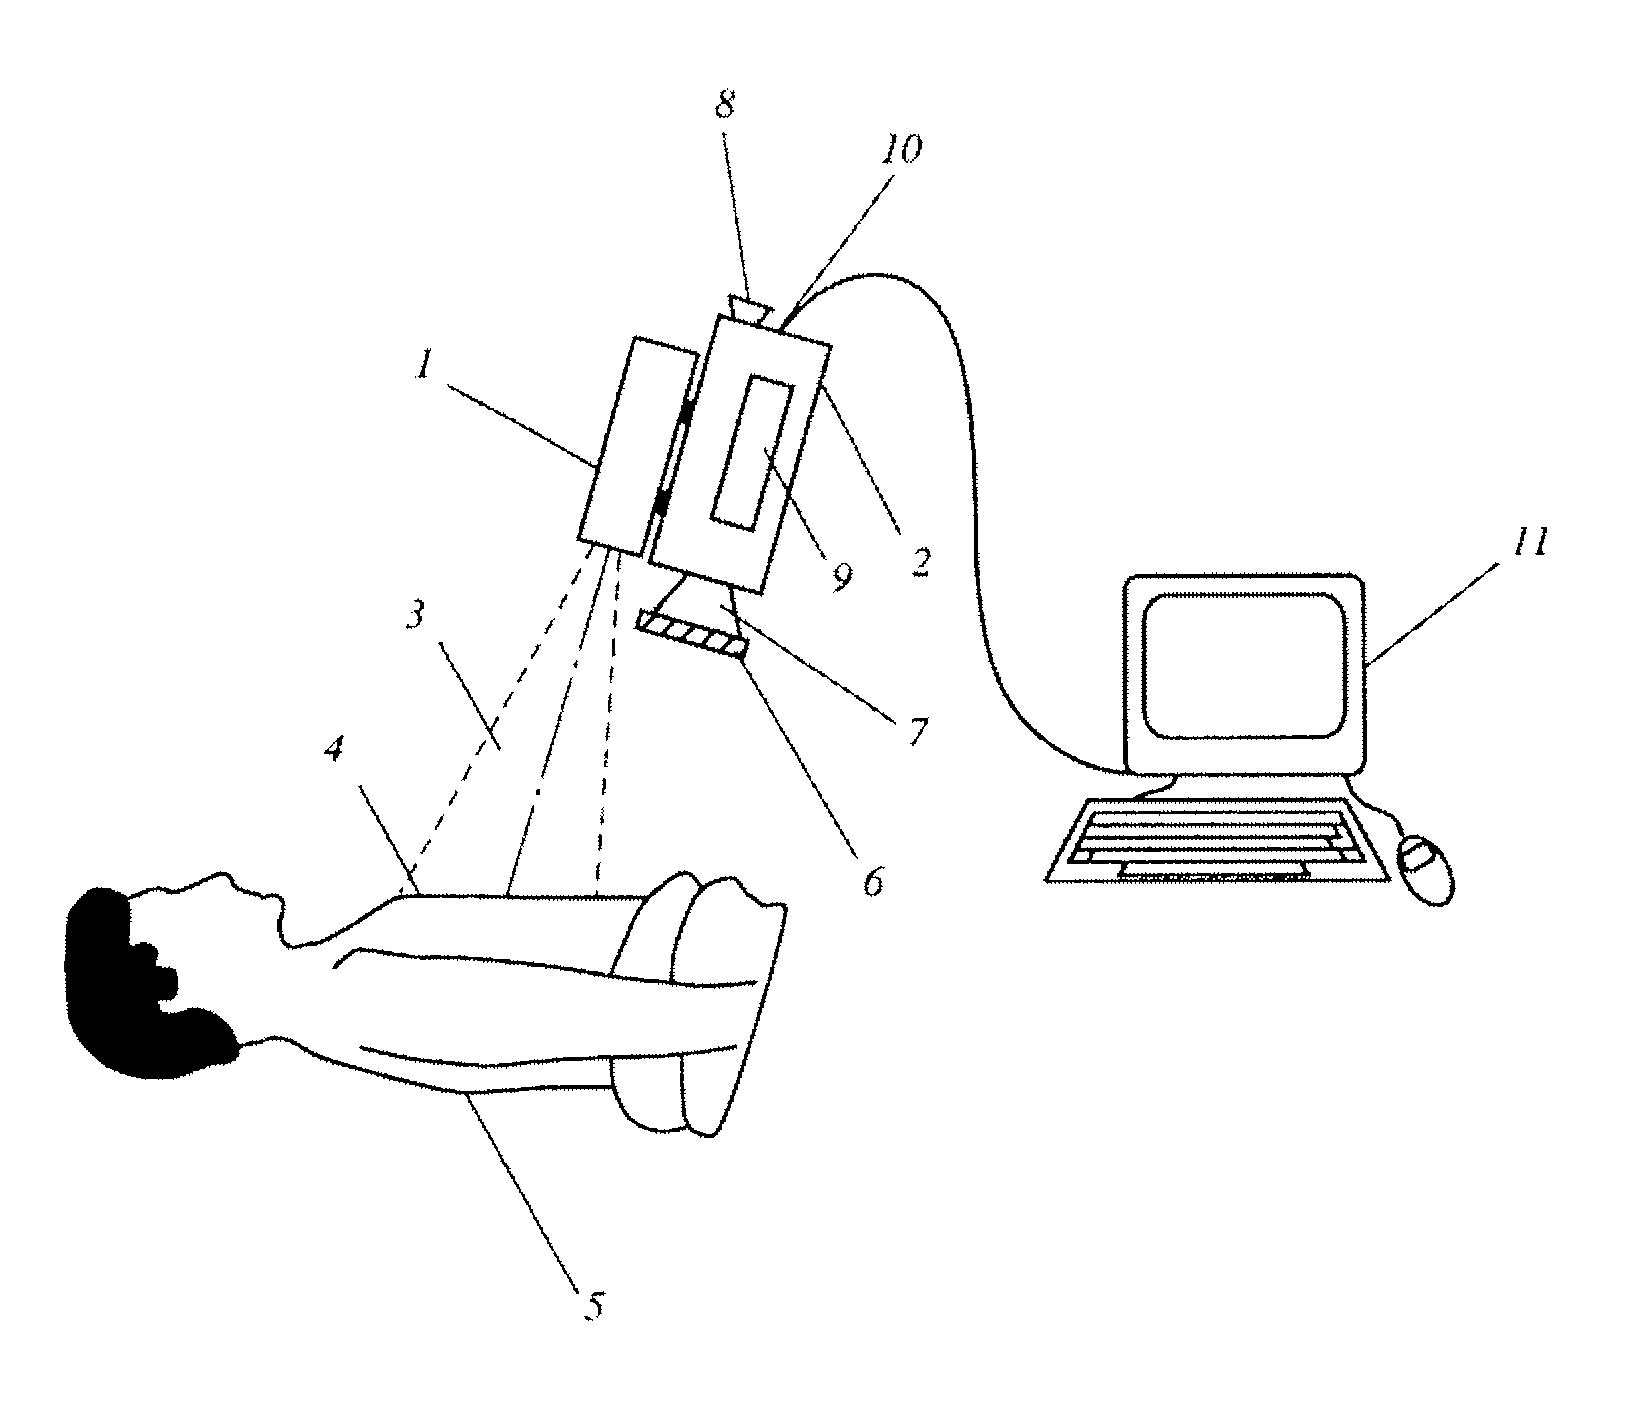 Patent US 9,936,887 B2